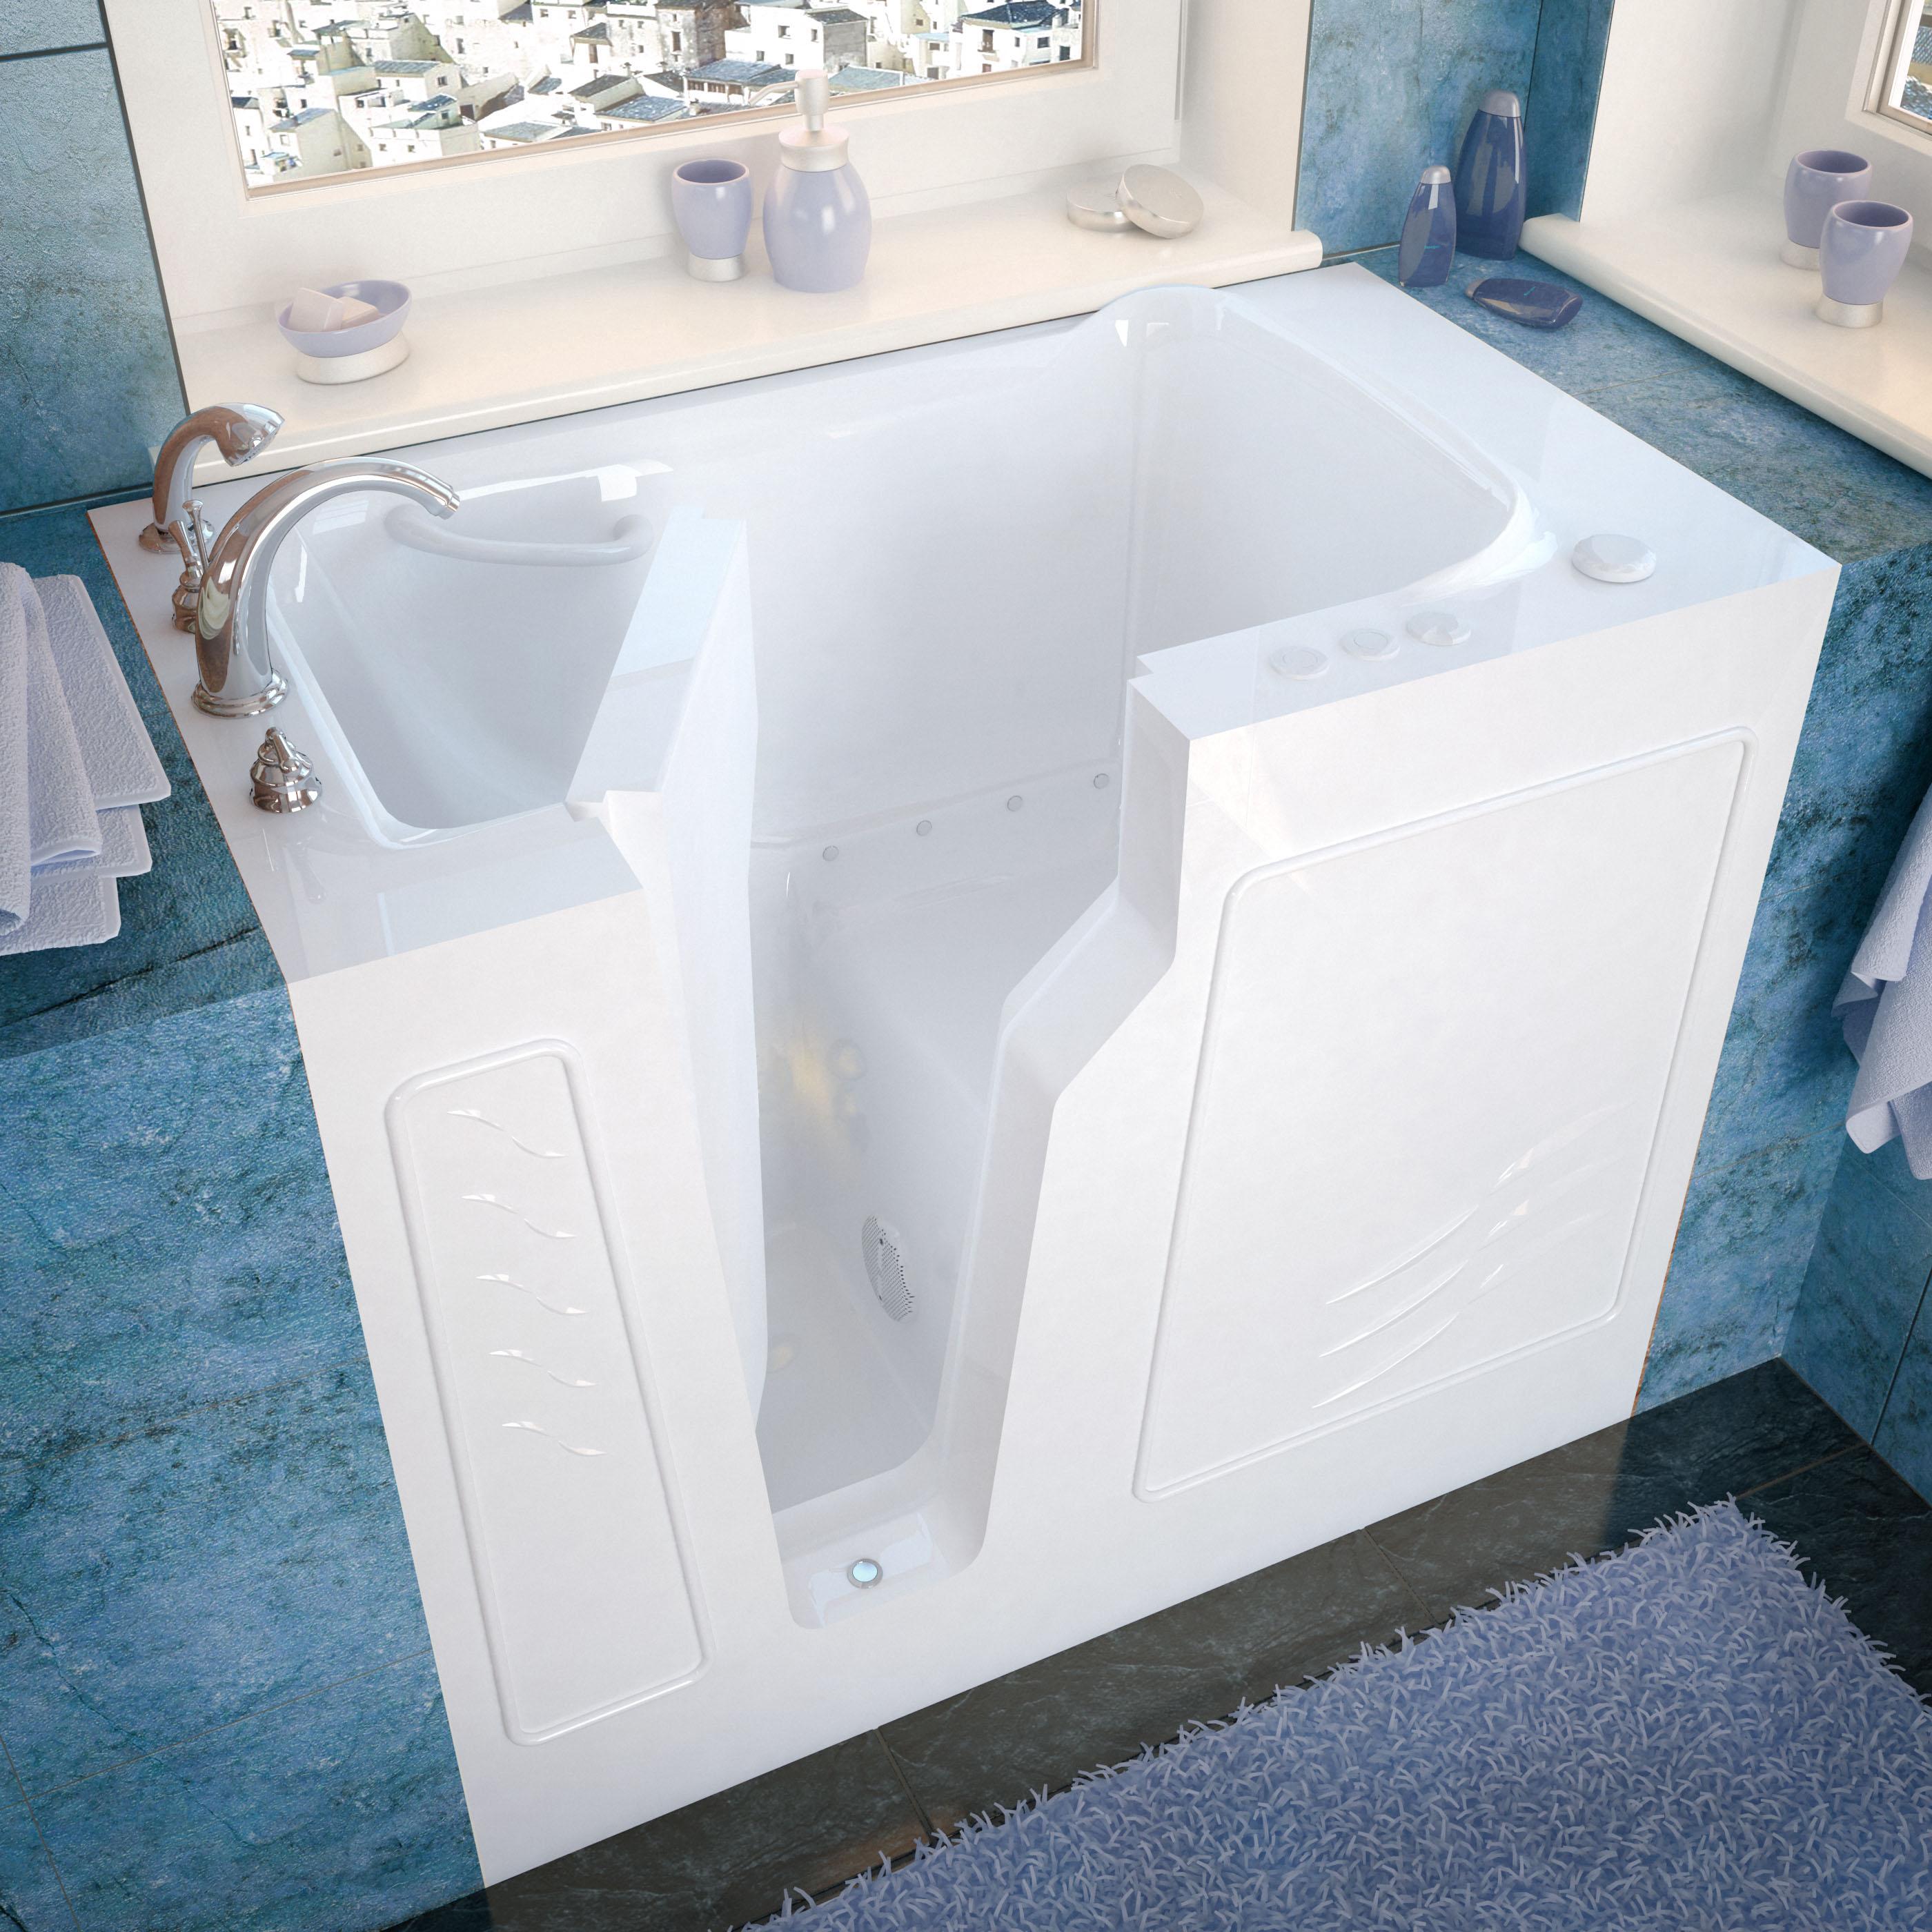 26x46 Left Drain White Air Jetted Walk-In Bathtub